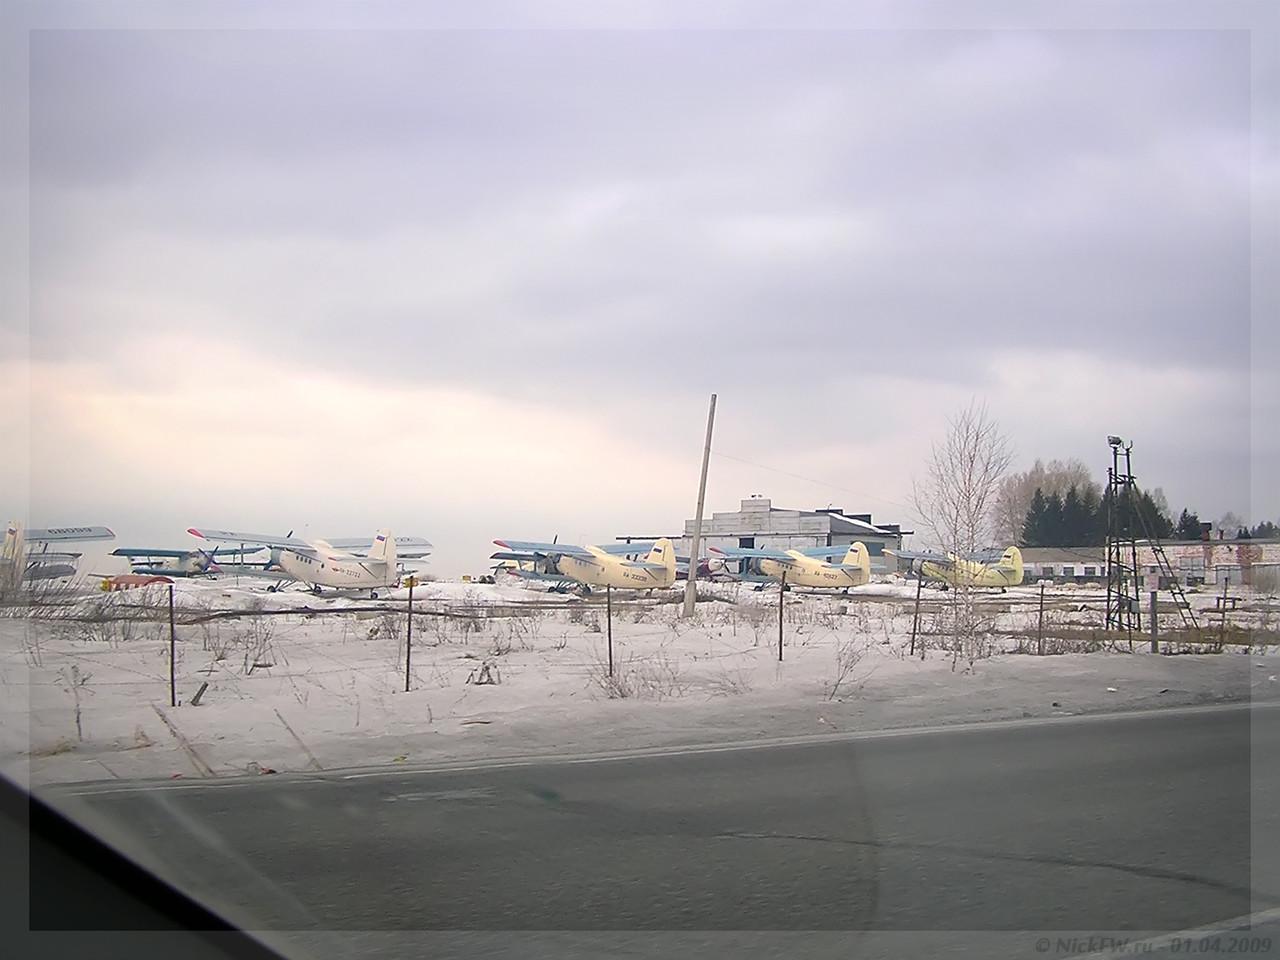 Аэропорт Ачинск (© NickFW - 01.04.2009)